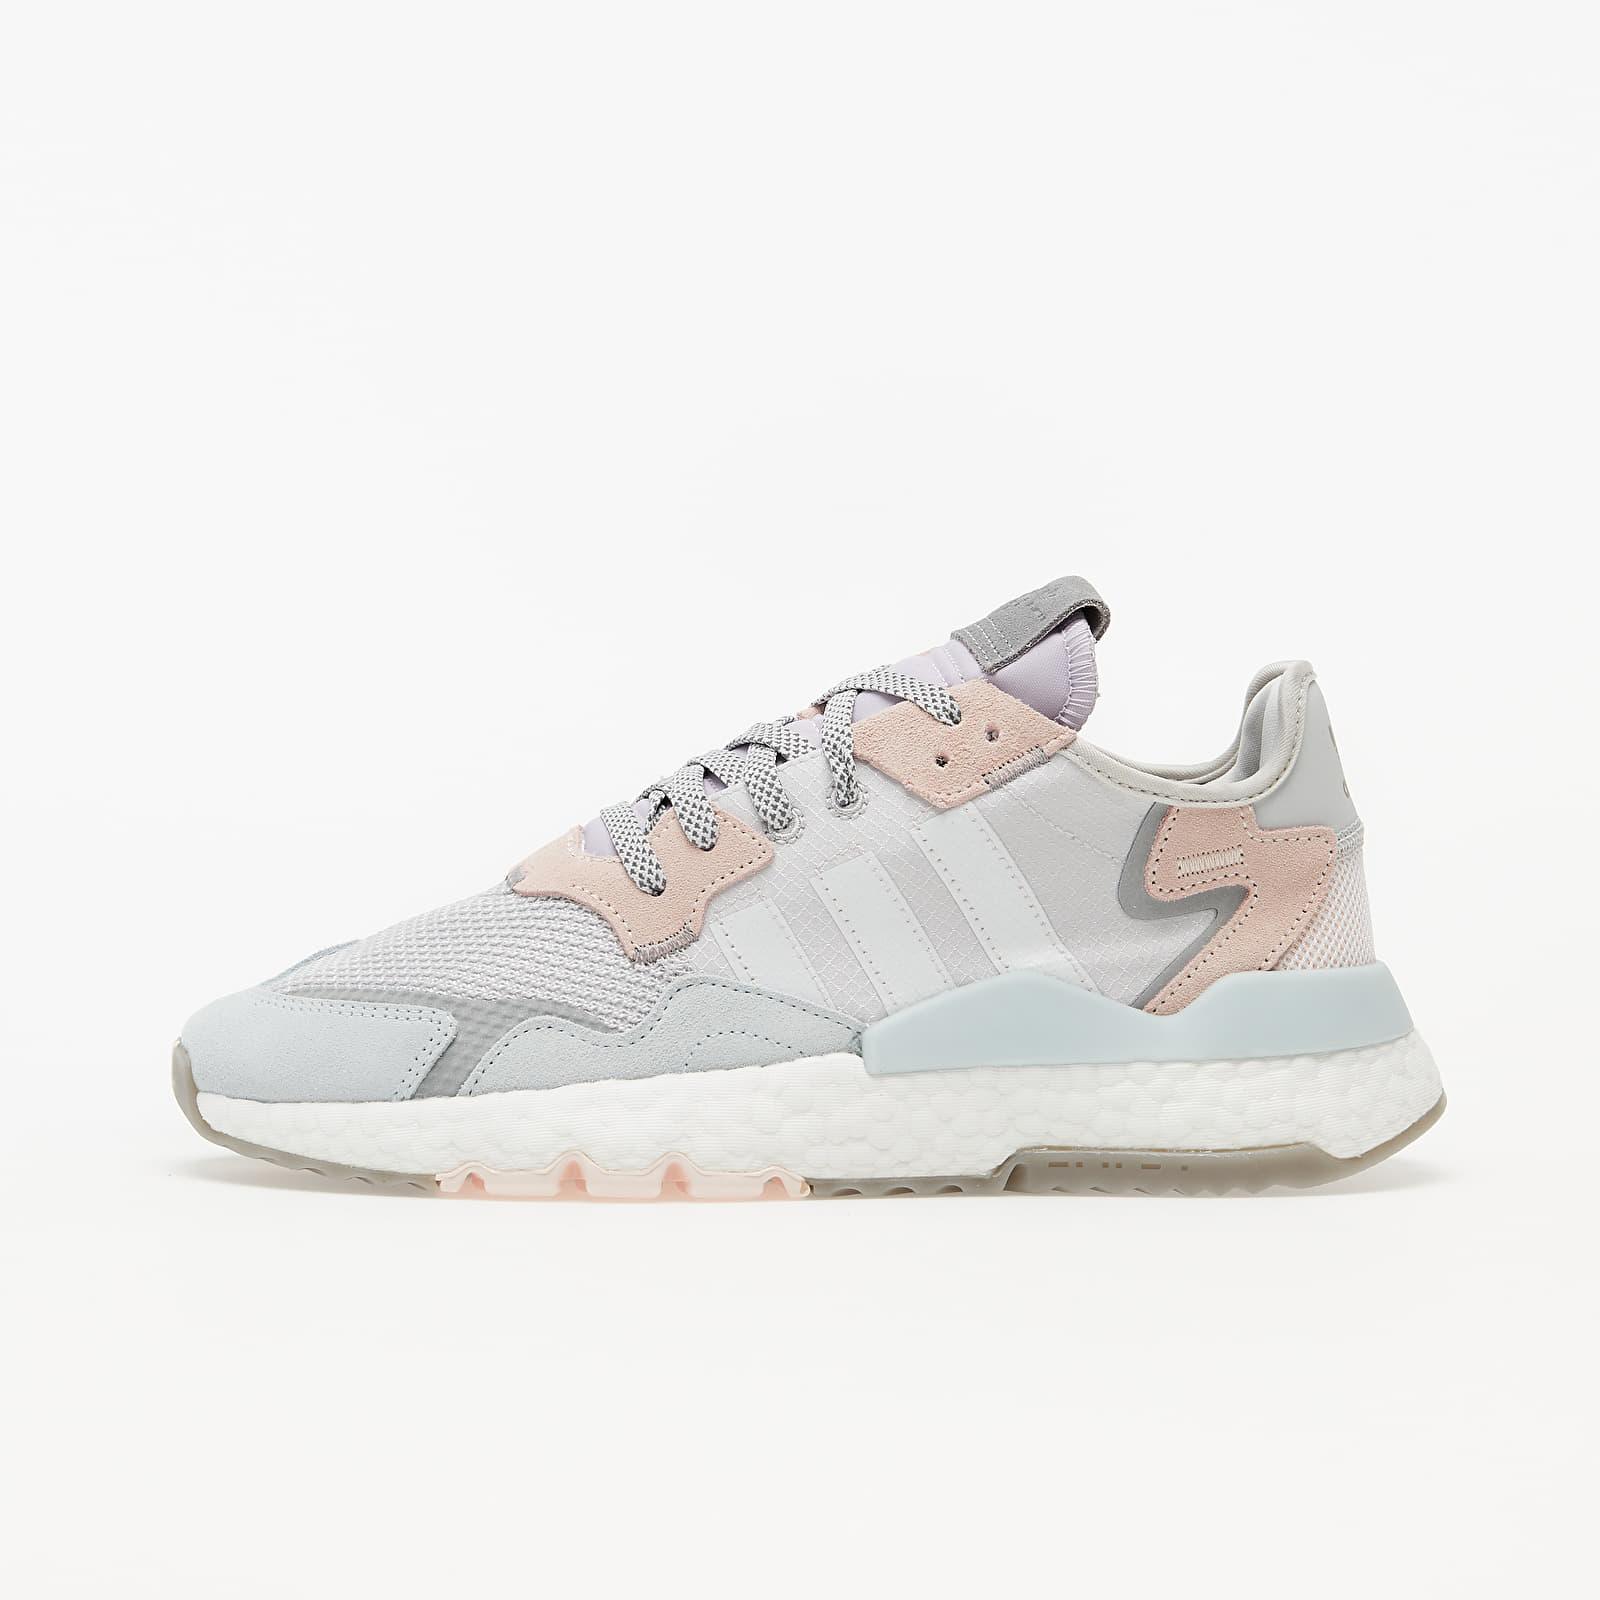 adidas Nite Jogger W Grey One/ Ftw White/ Pink Tint EUR 41 1/3